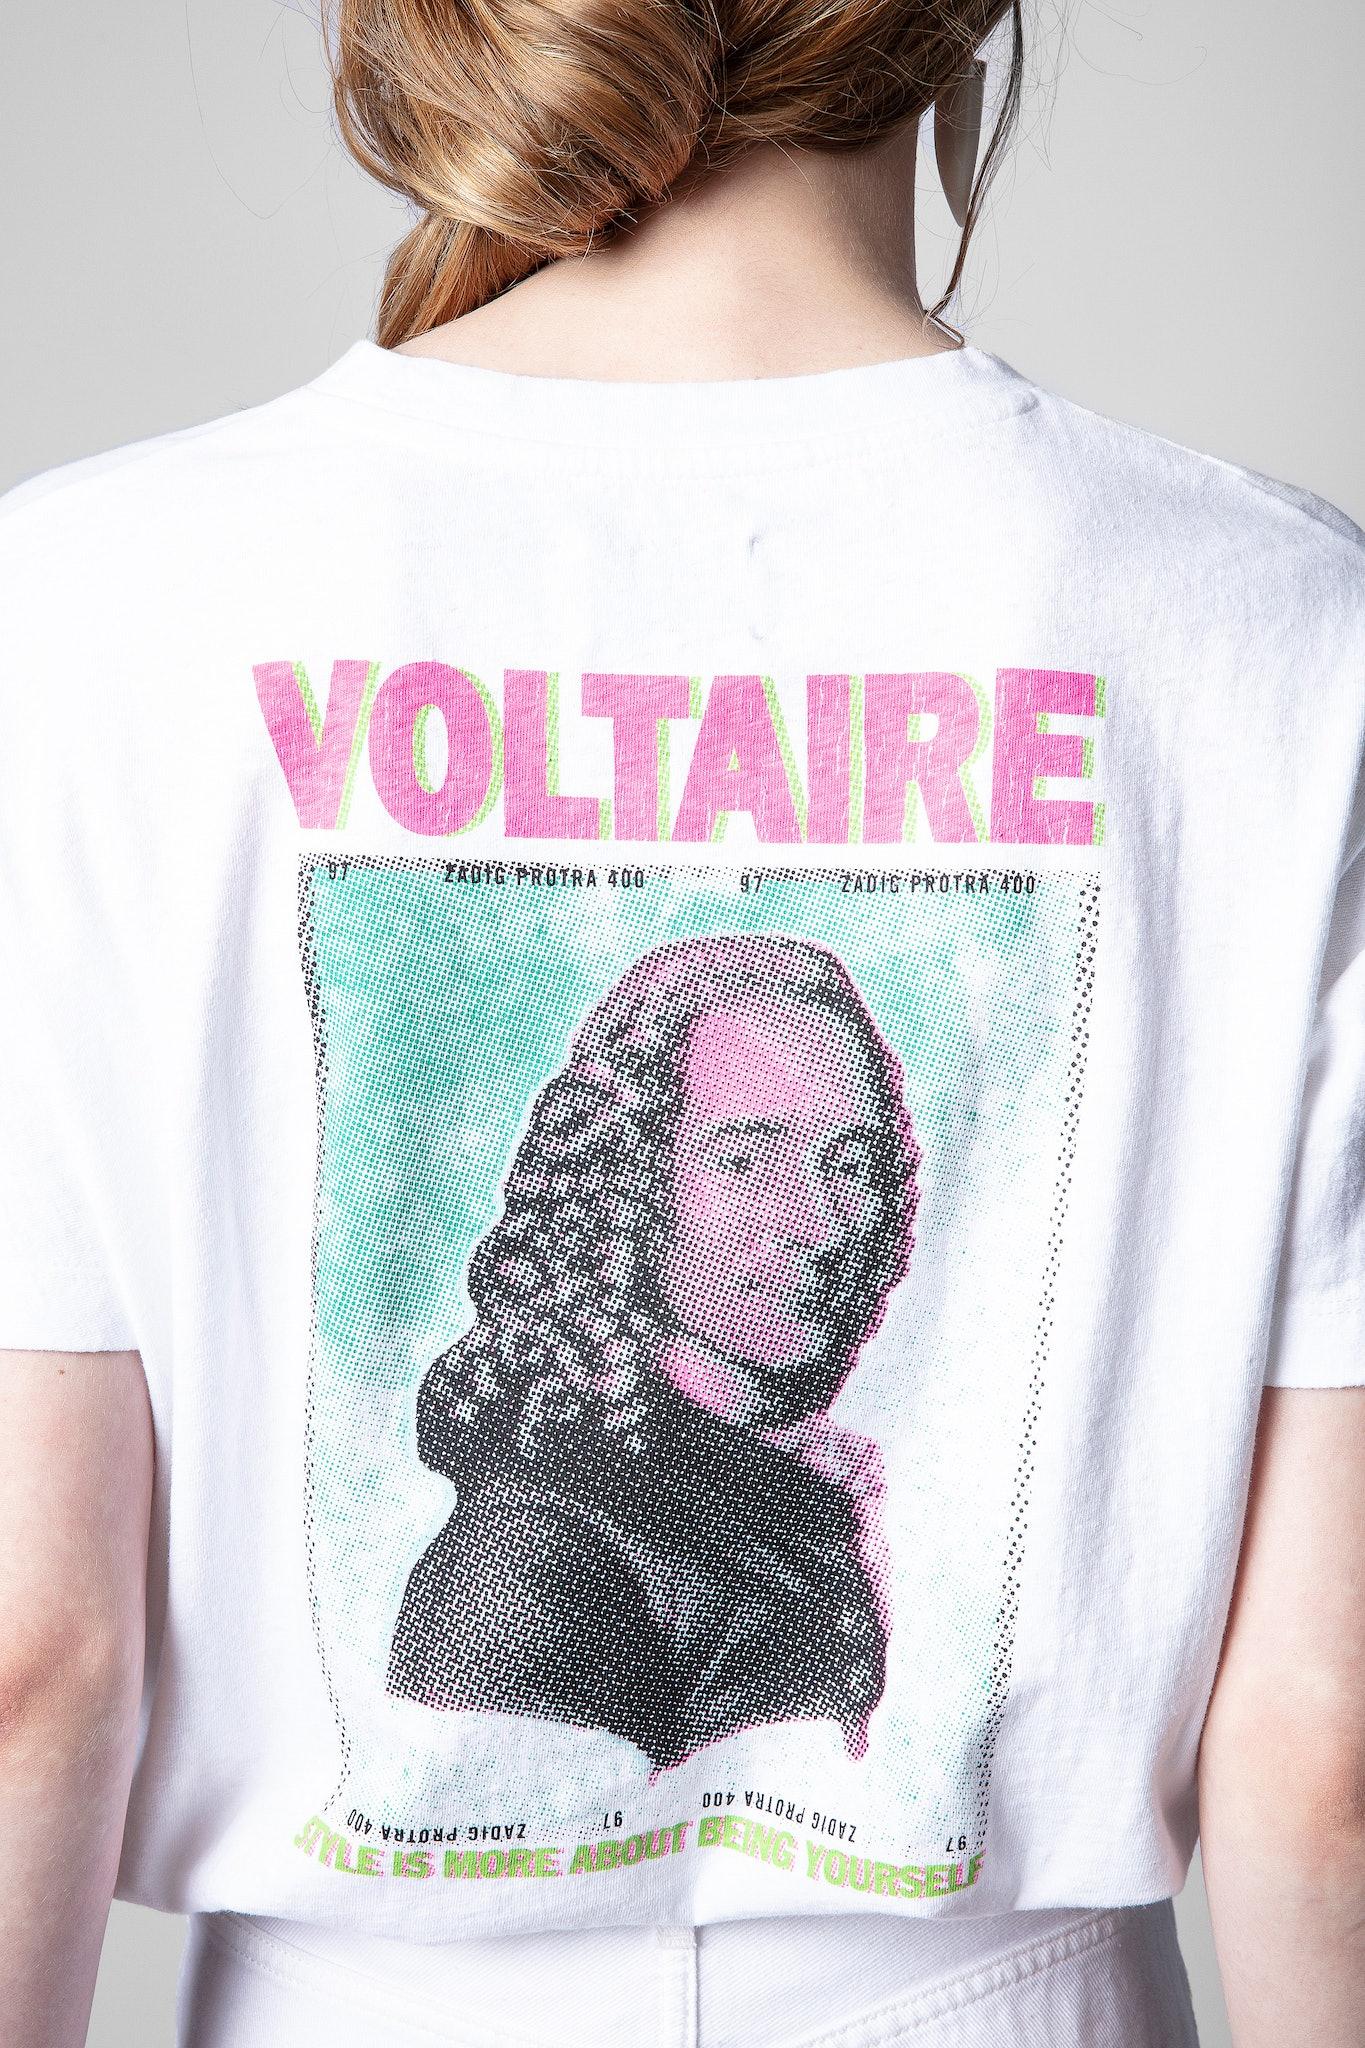 Camiseta Tom Voltaire Happy